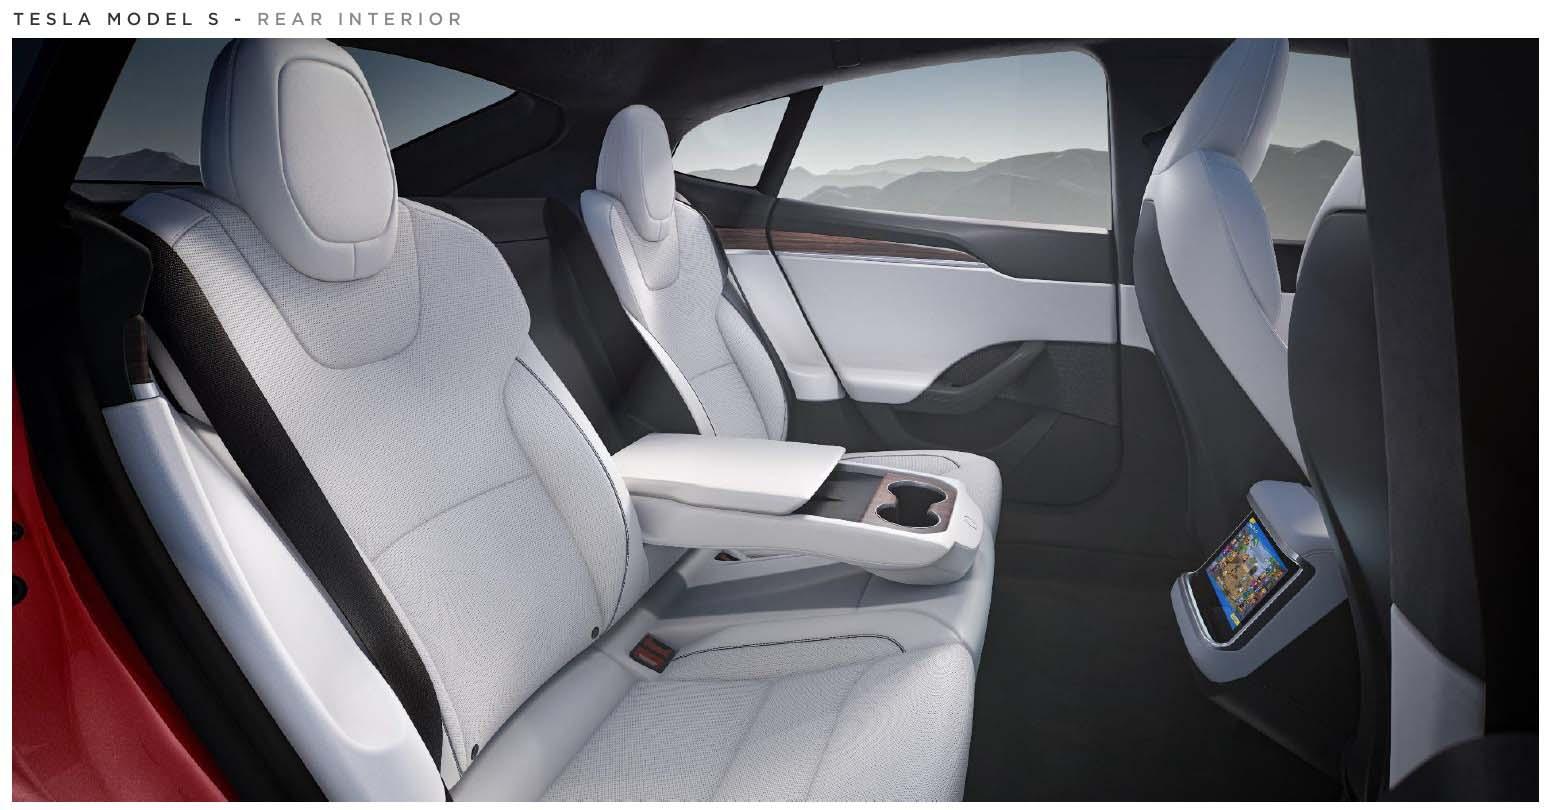 Tesla-Model-S-refresh-interior-back